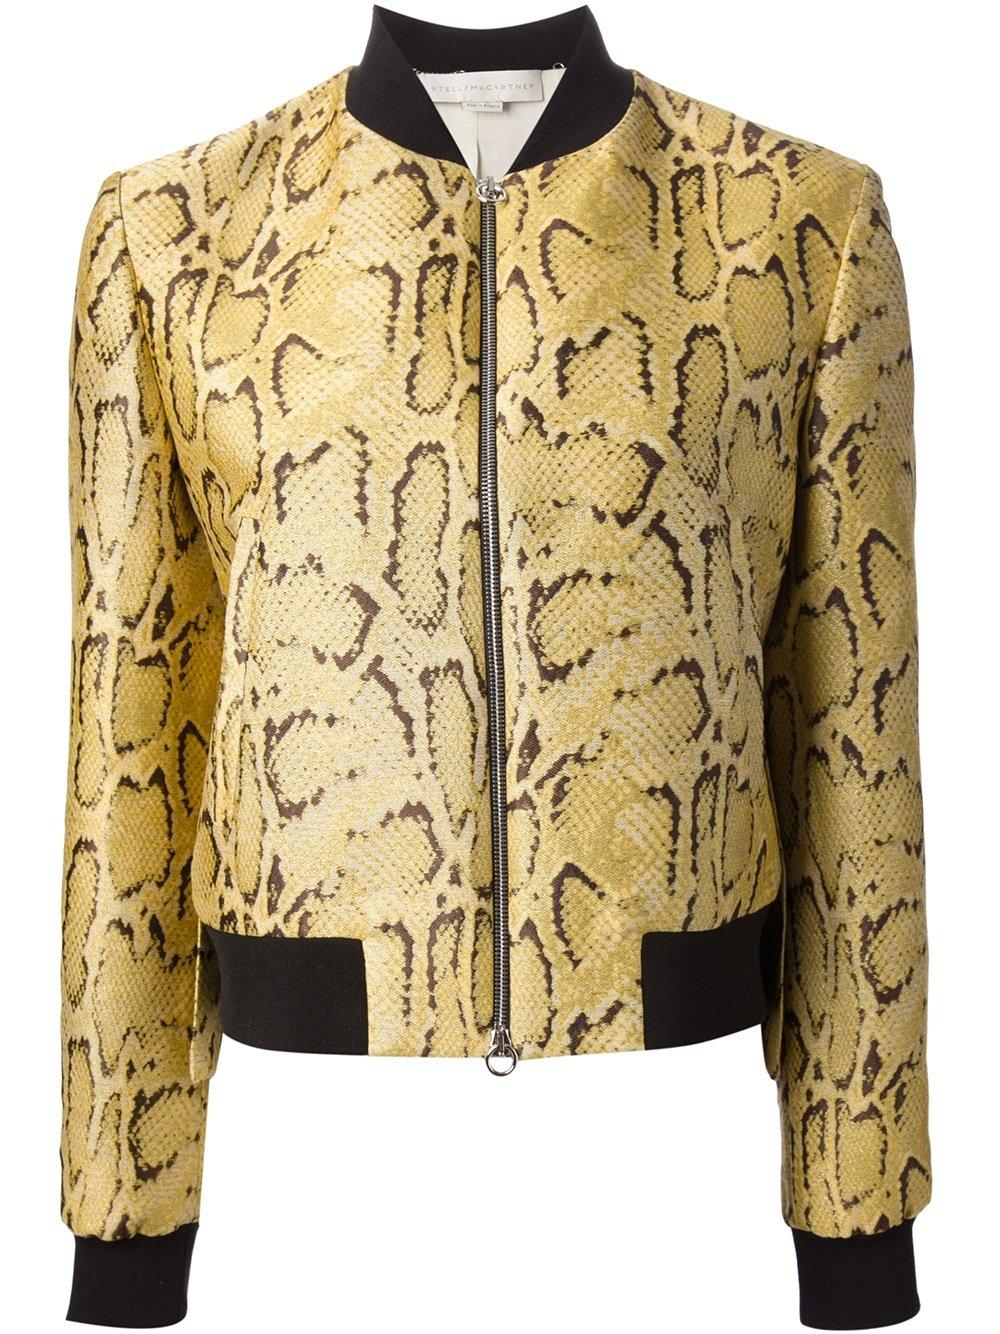 Stella mccartney Snakeskin Print Bomber Jacket   Lyst